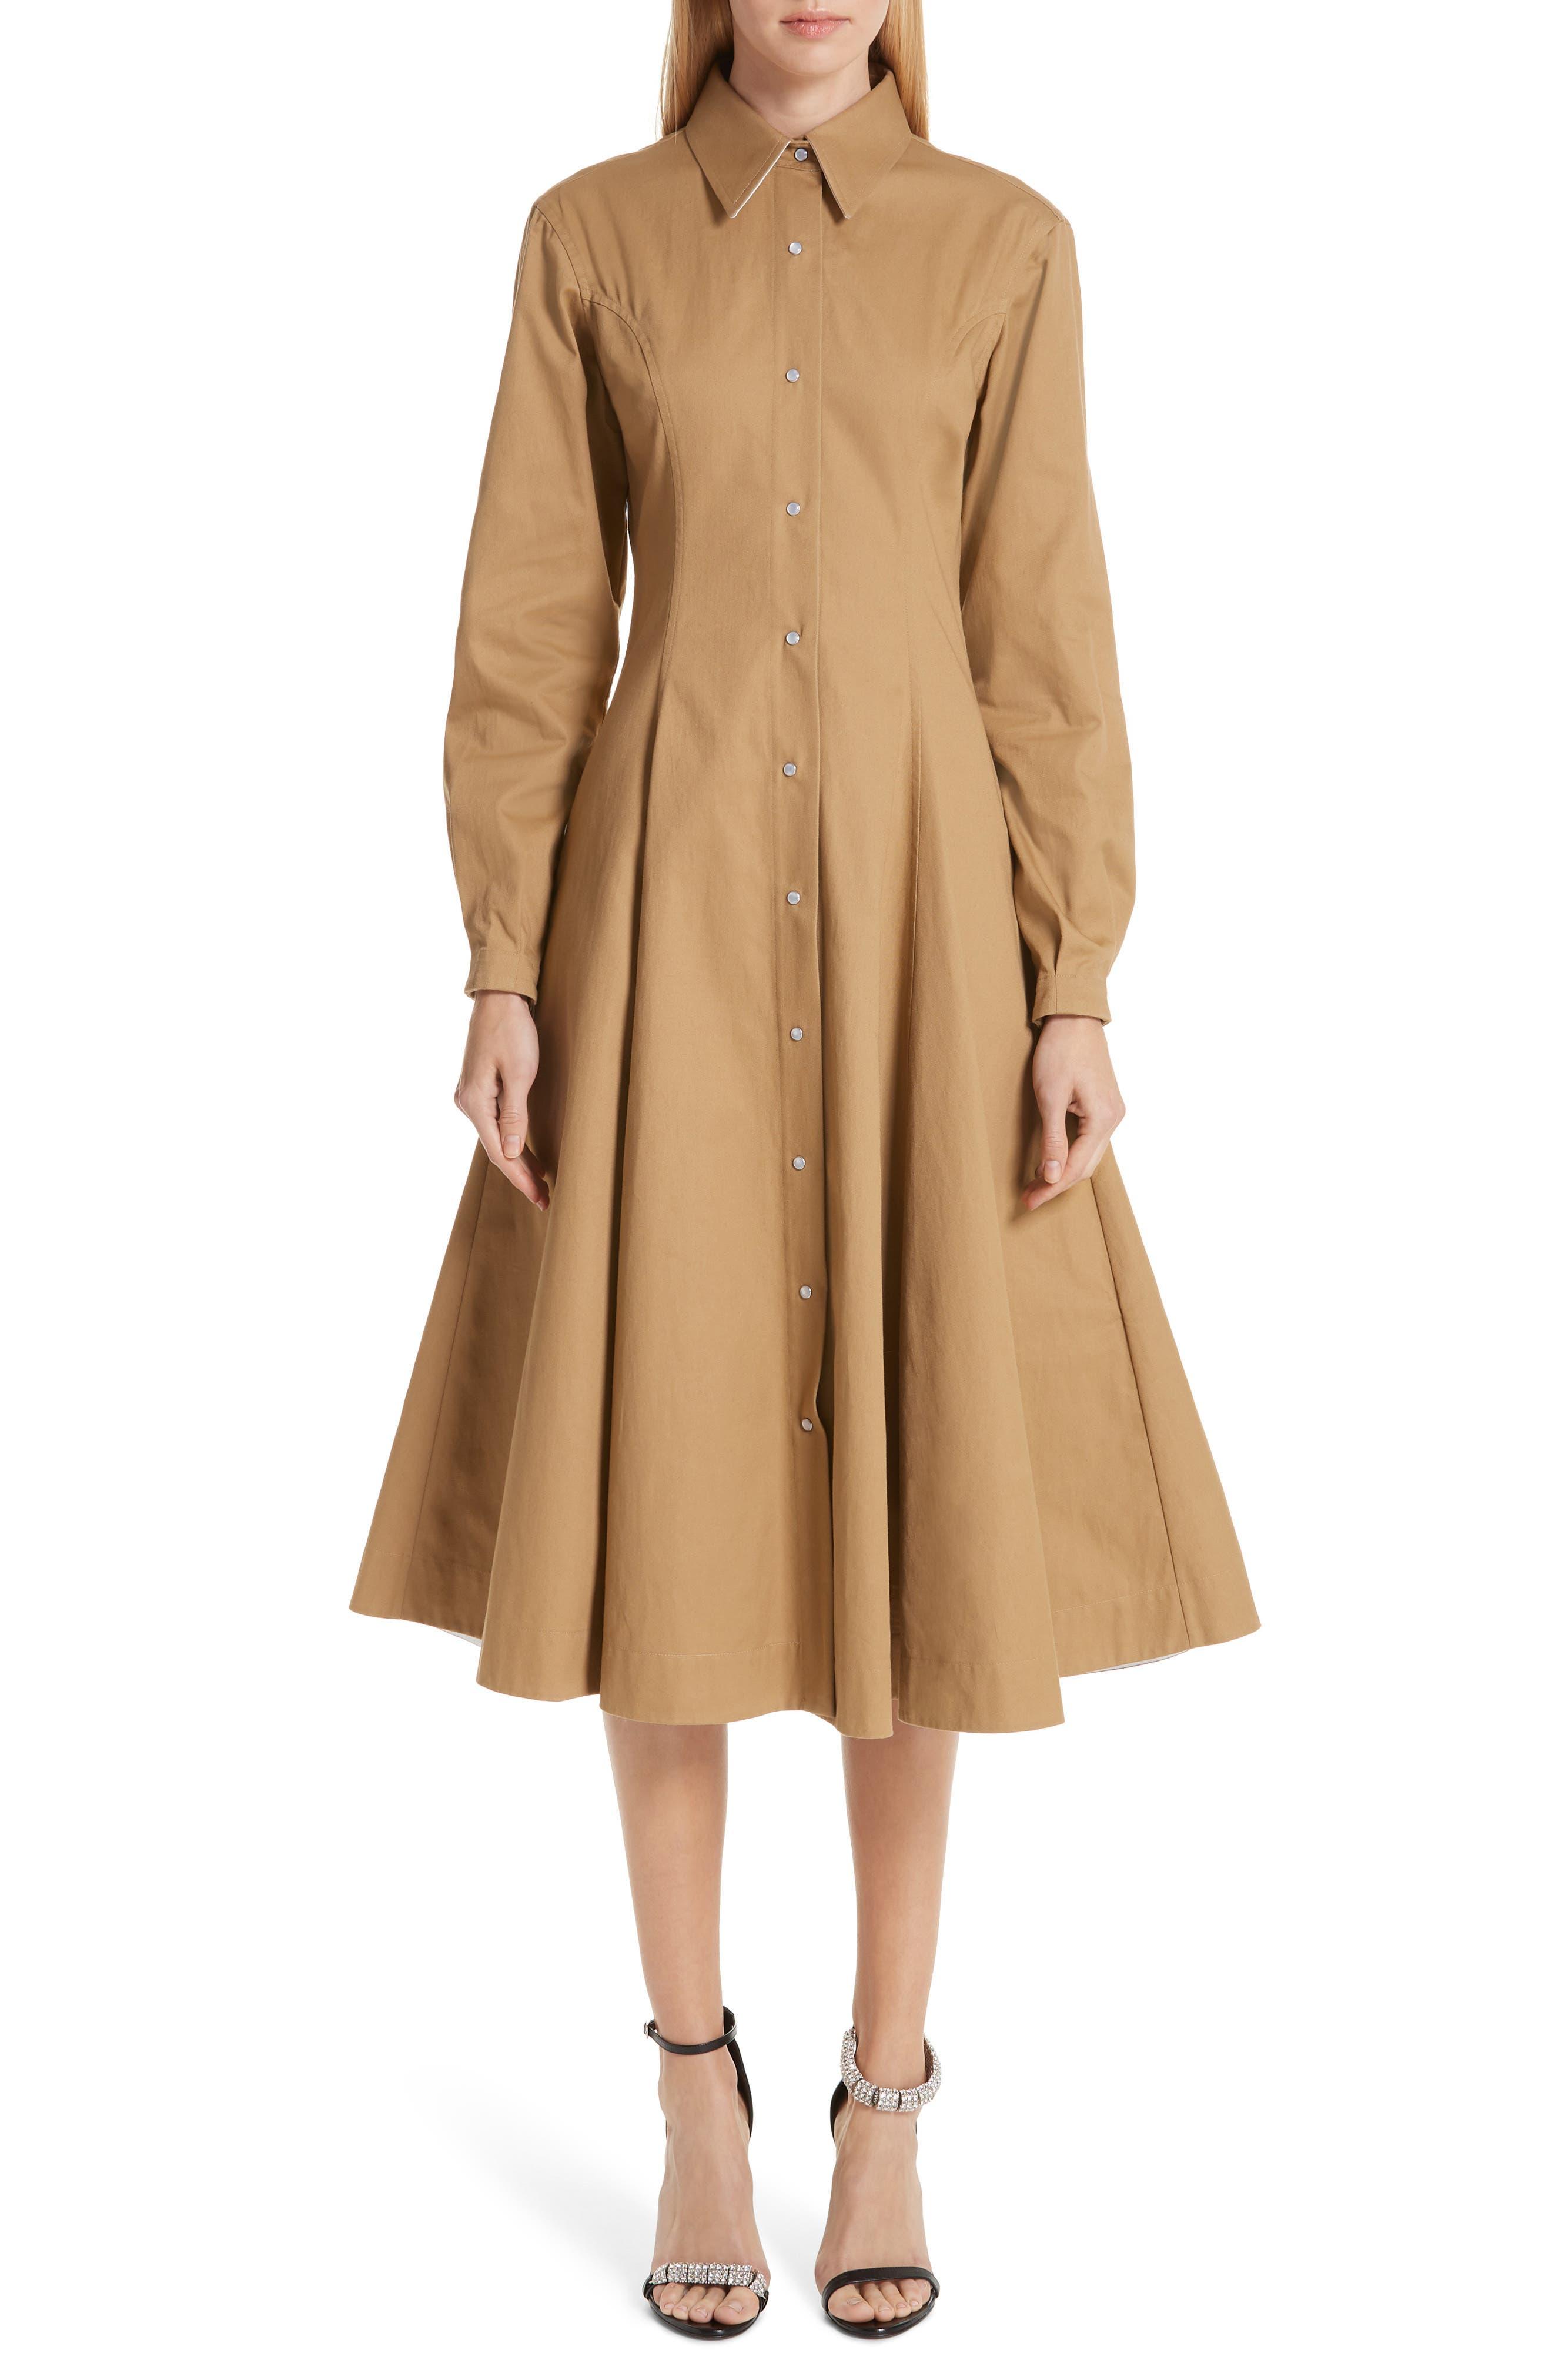 Calvin Klein 205W39Nyc Western Twill A-Line Midi Dress, US / 42 IT - Beige